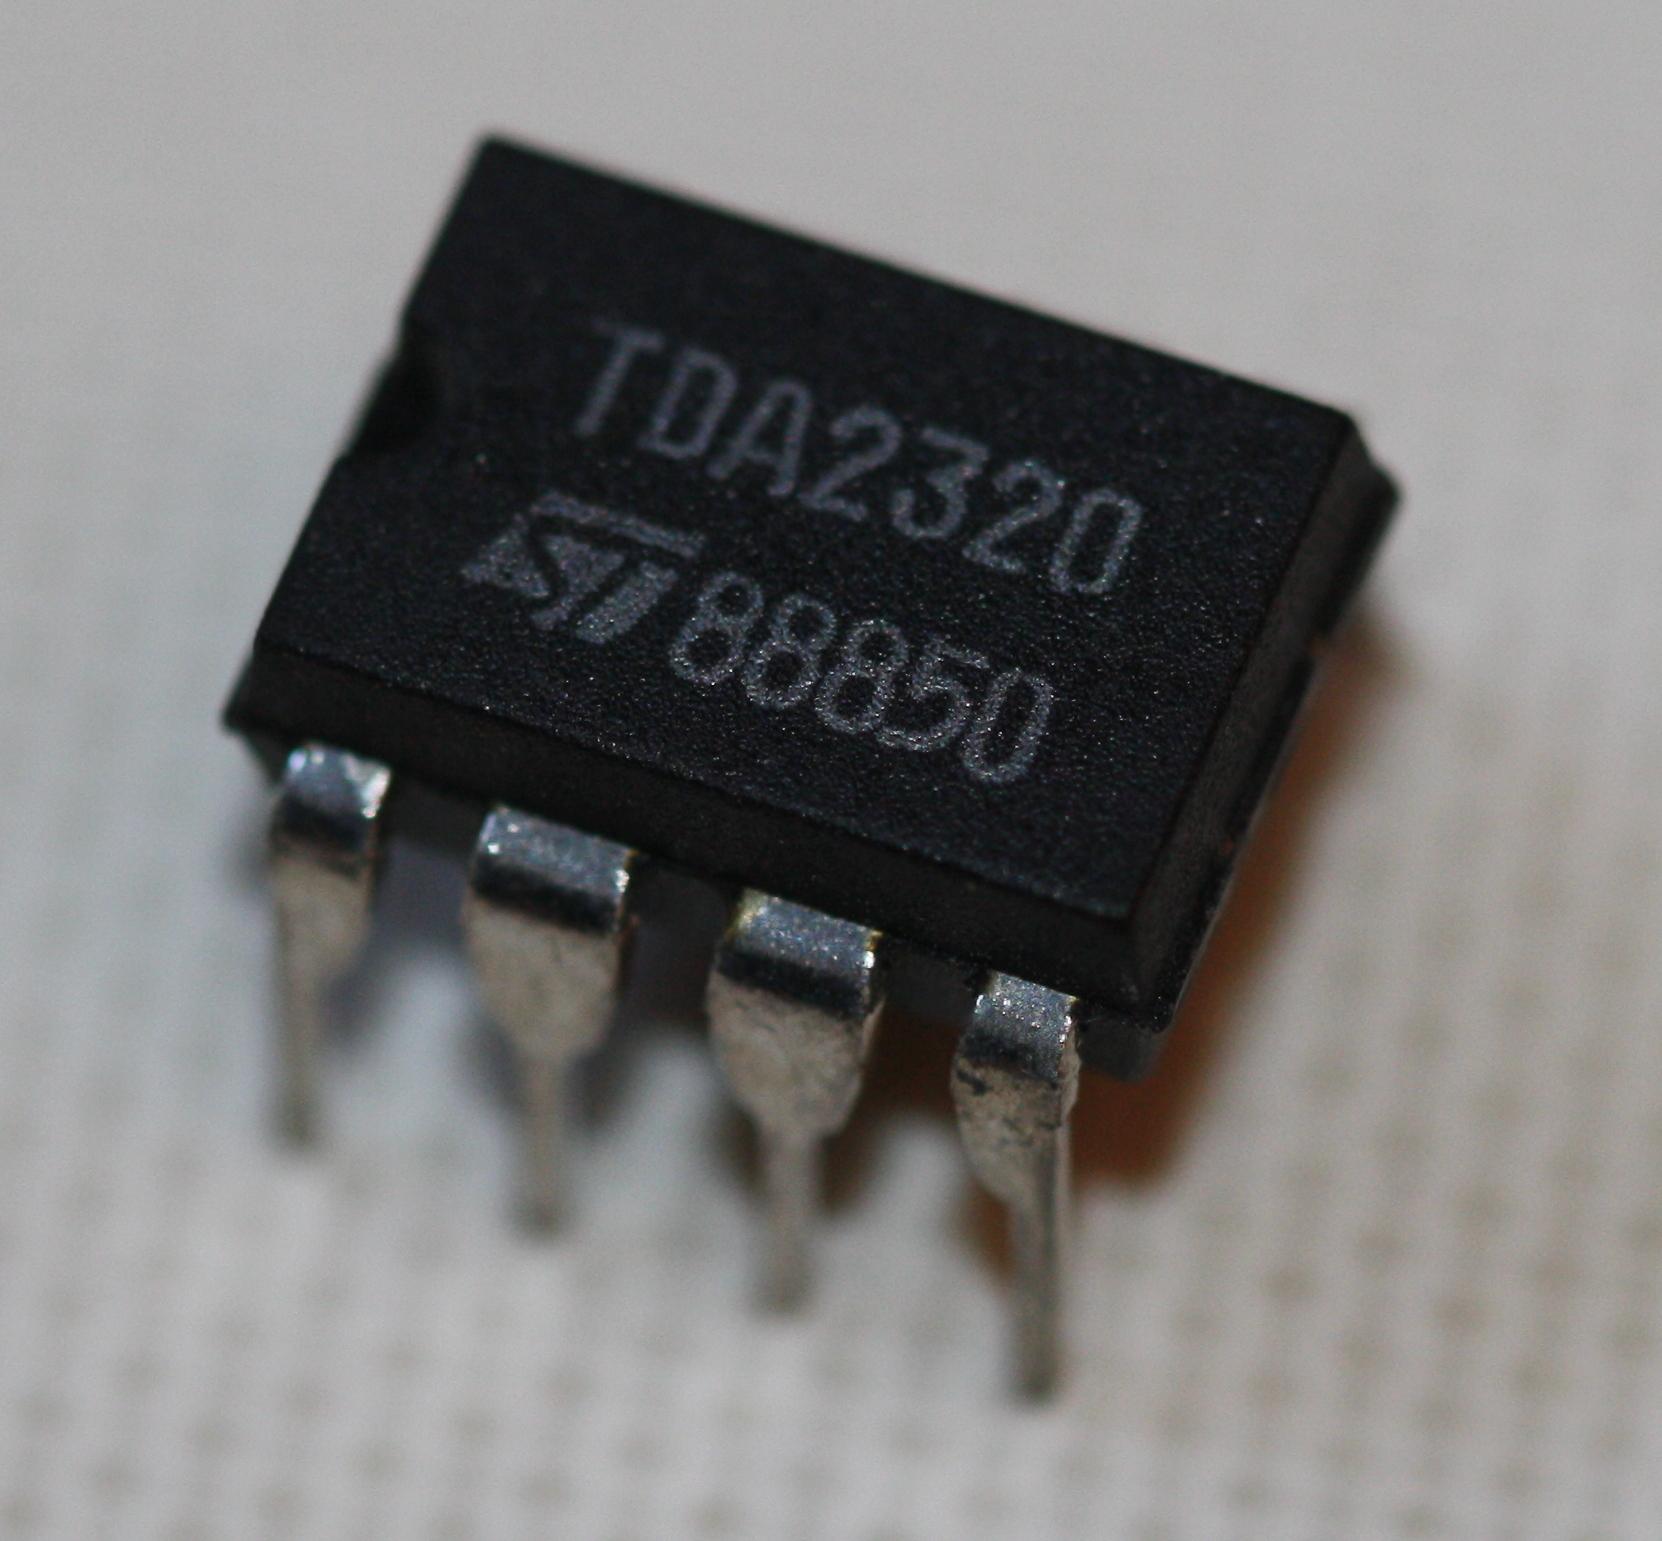 Bridge Stereo Amp 22w Multiwatt11 Elektronik Lavpris Aps Tda4935 Amplifier Circuit Preamplifier Dip 8